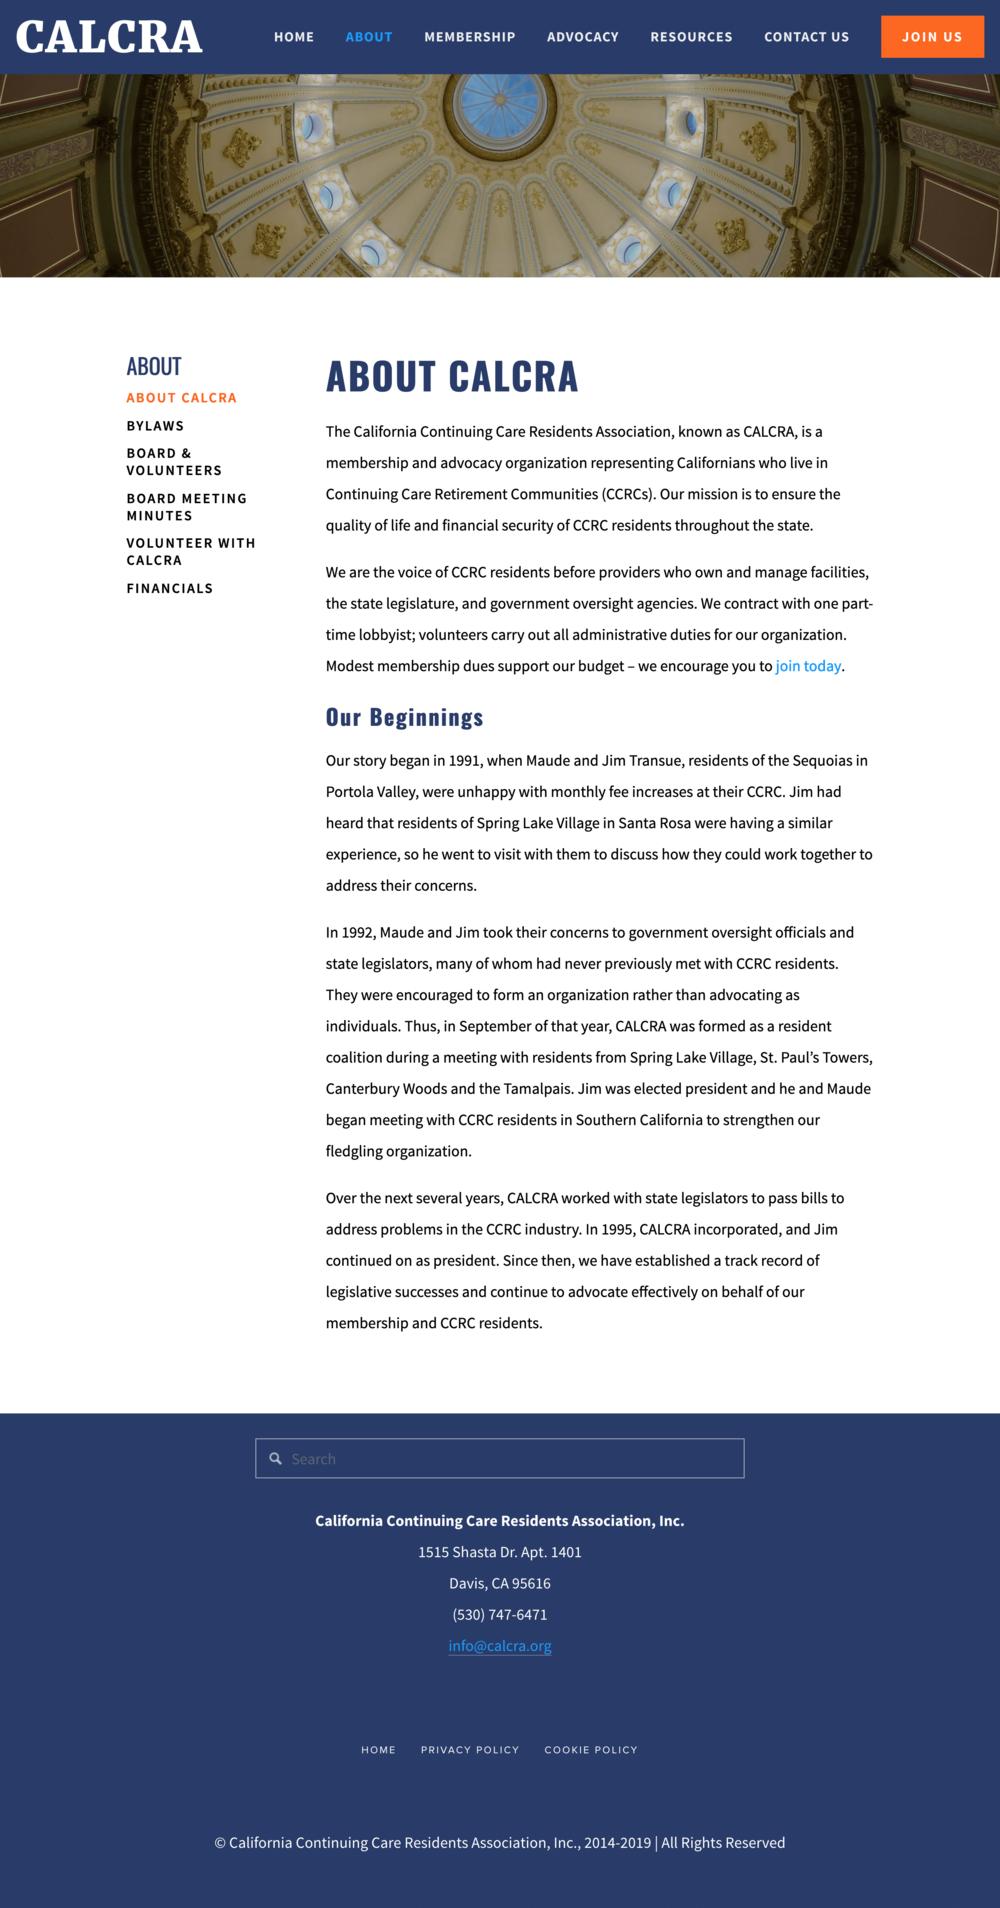 CALCRA About page screenshot